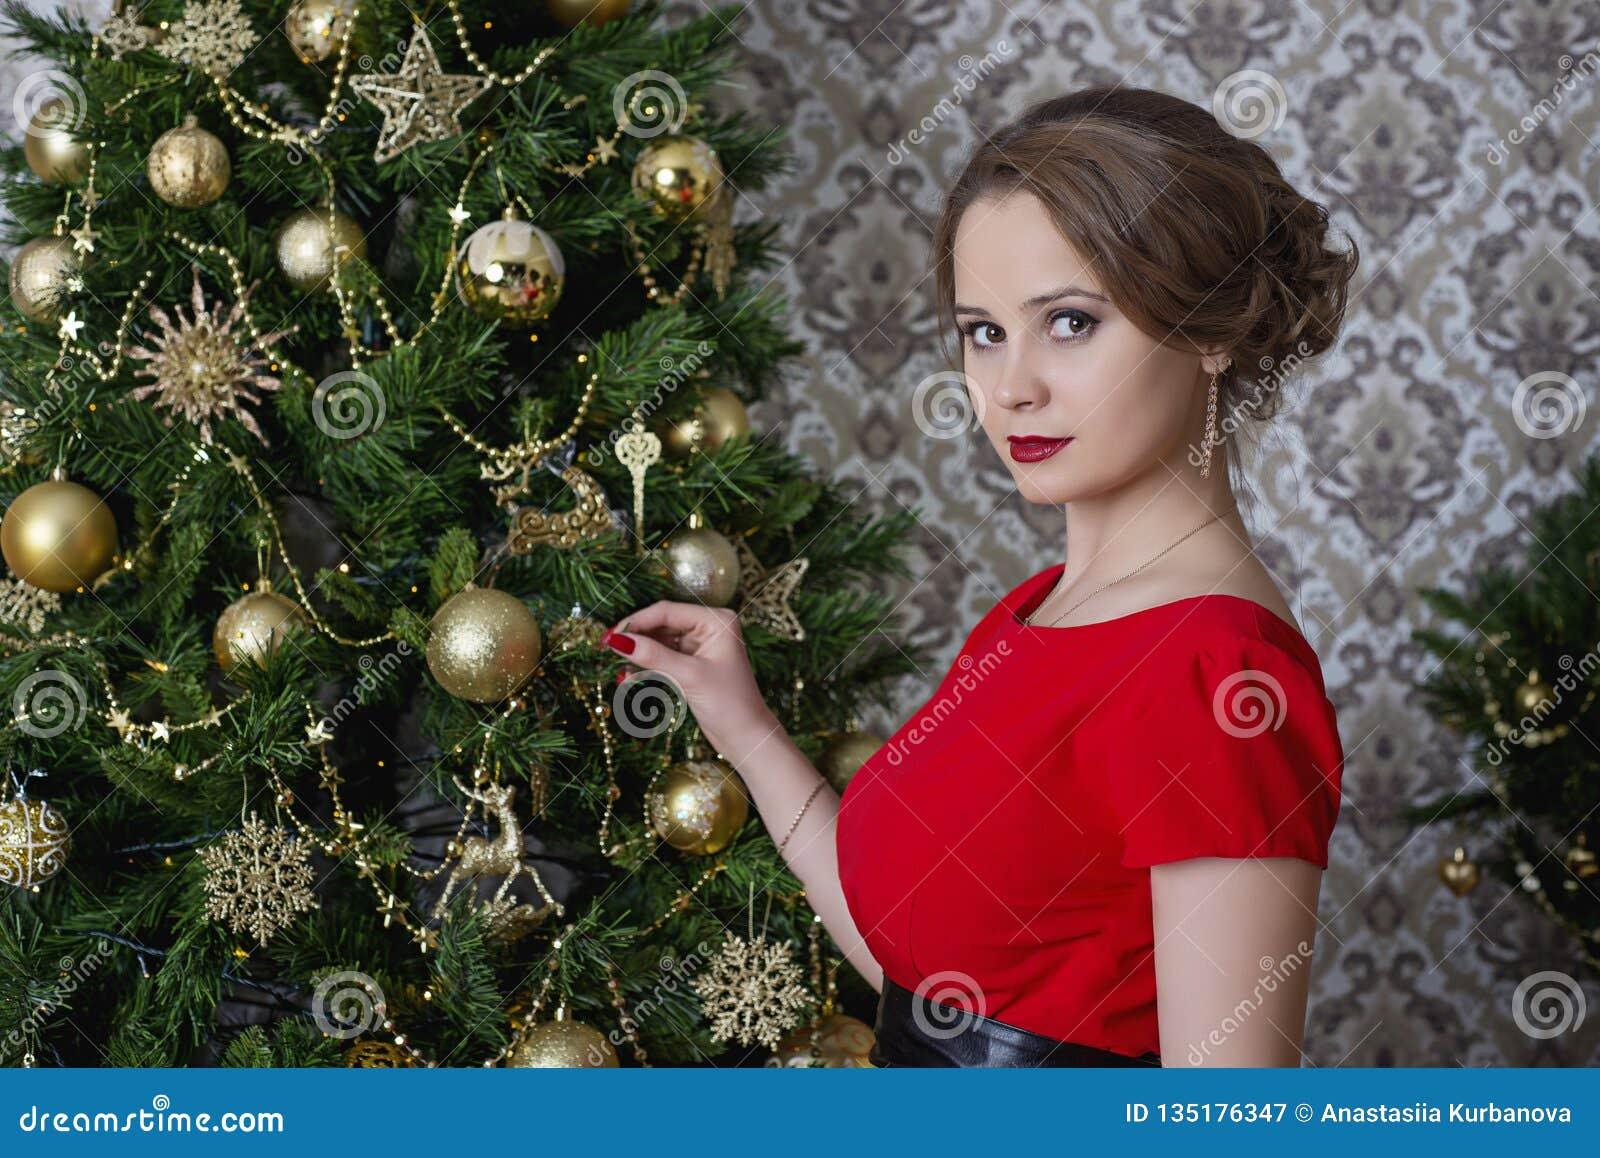 Girl in red christmas dress